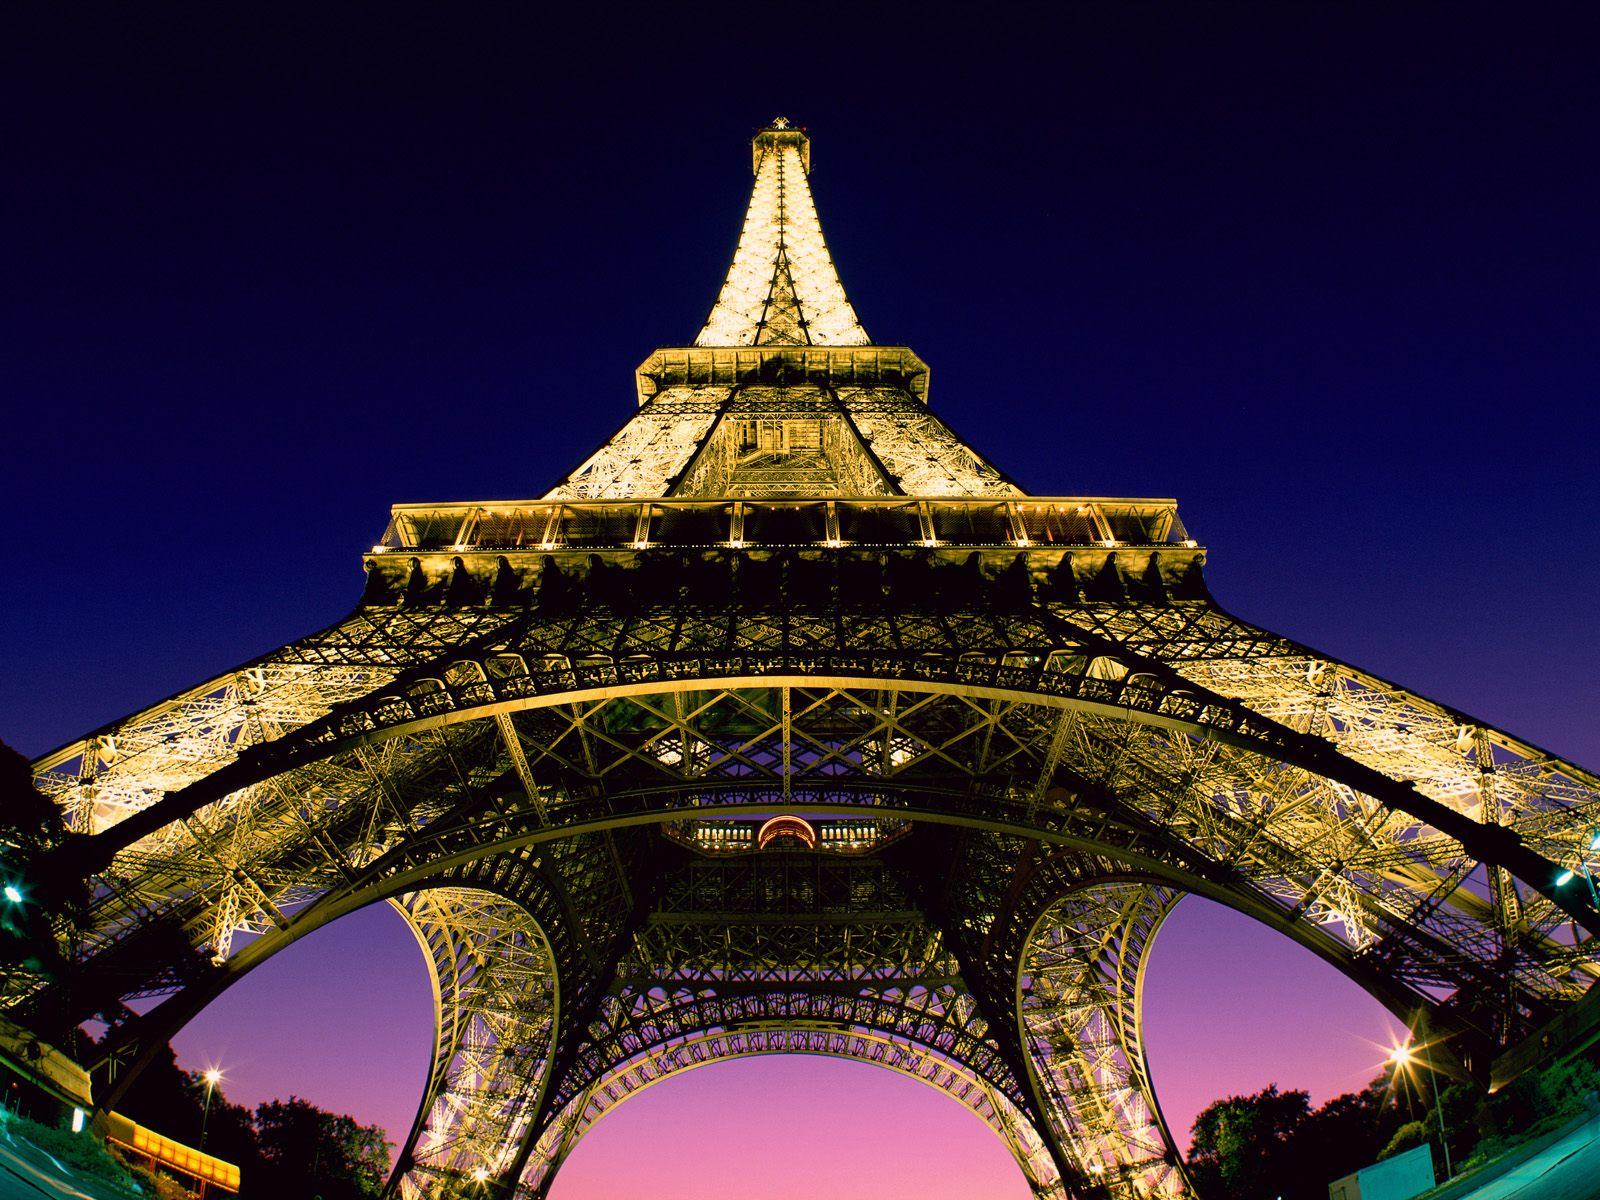 the eiffel tower in paris france. Black Bedroom Furniture Sets. Home Design Ideas